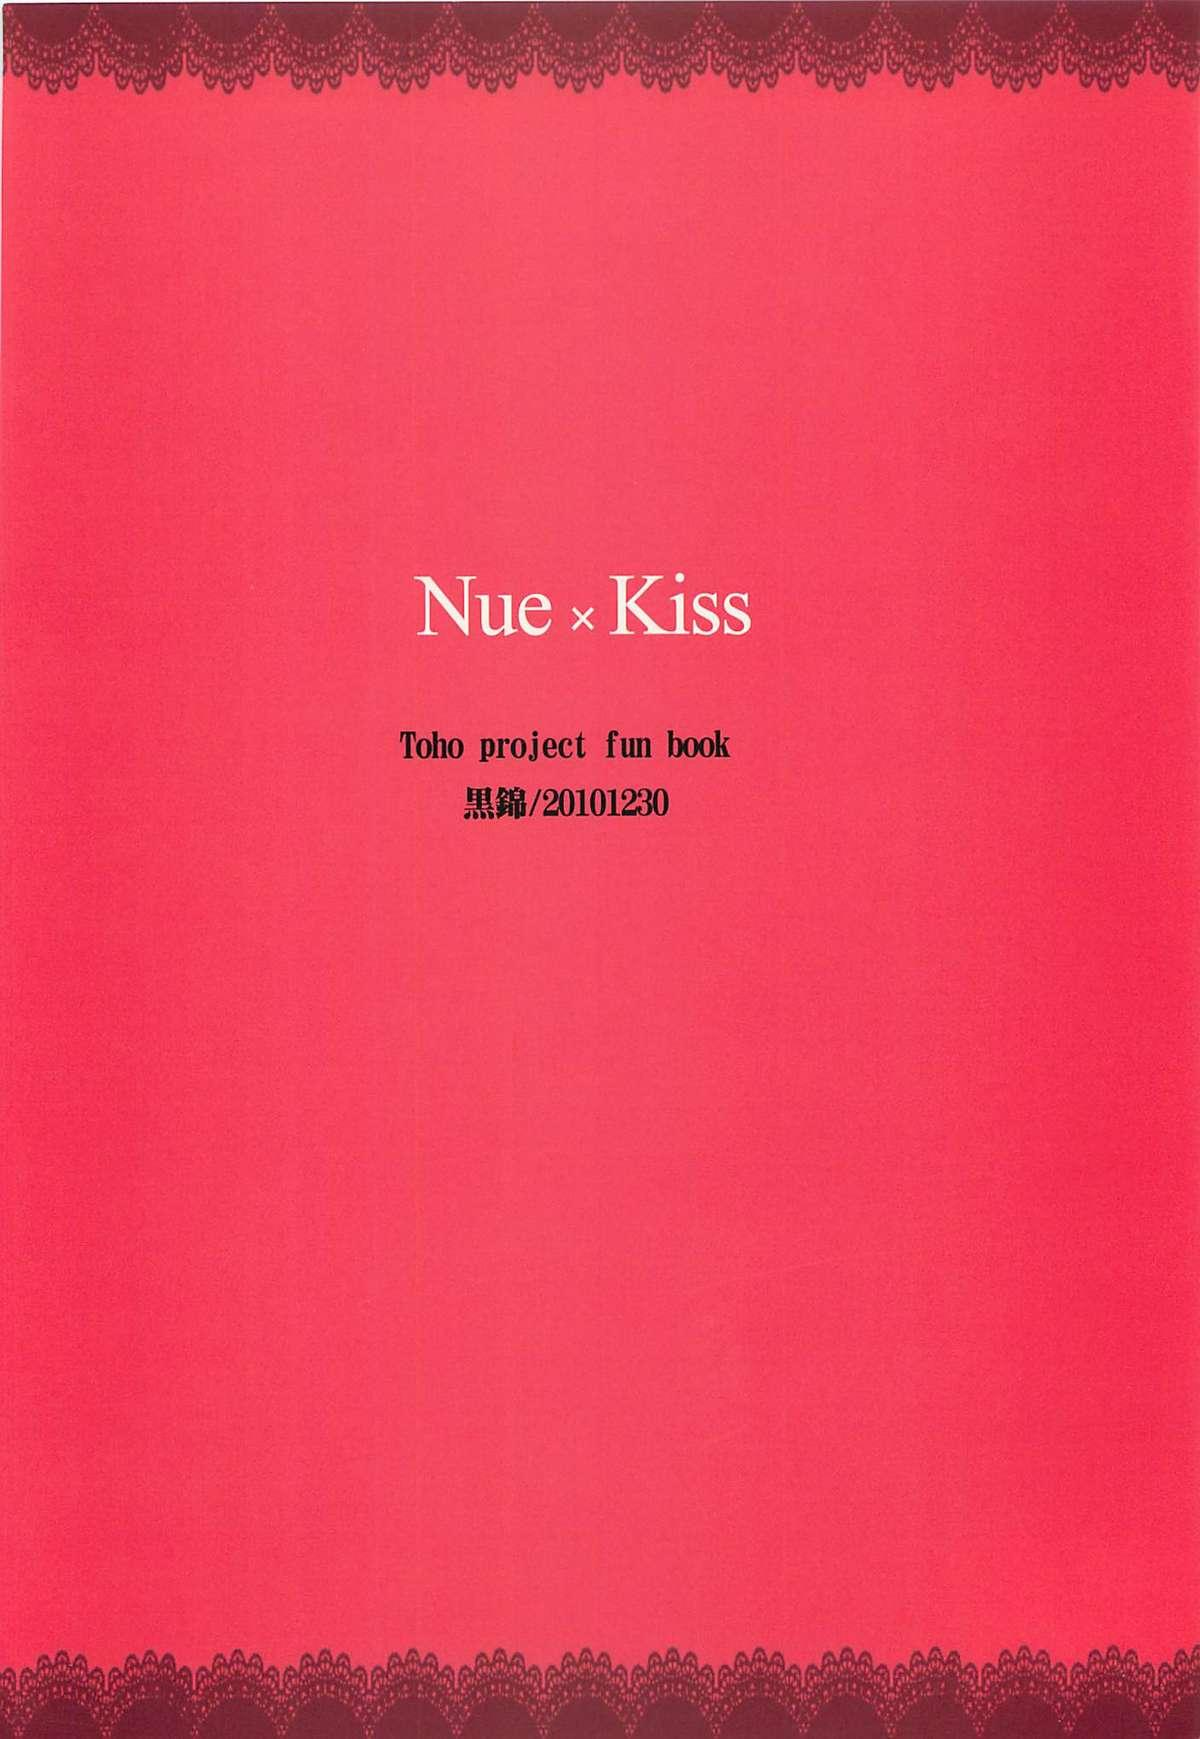 Nue x Kiss 29